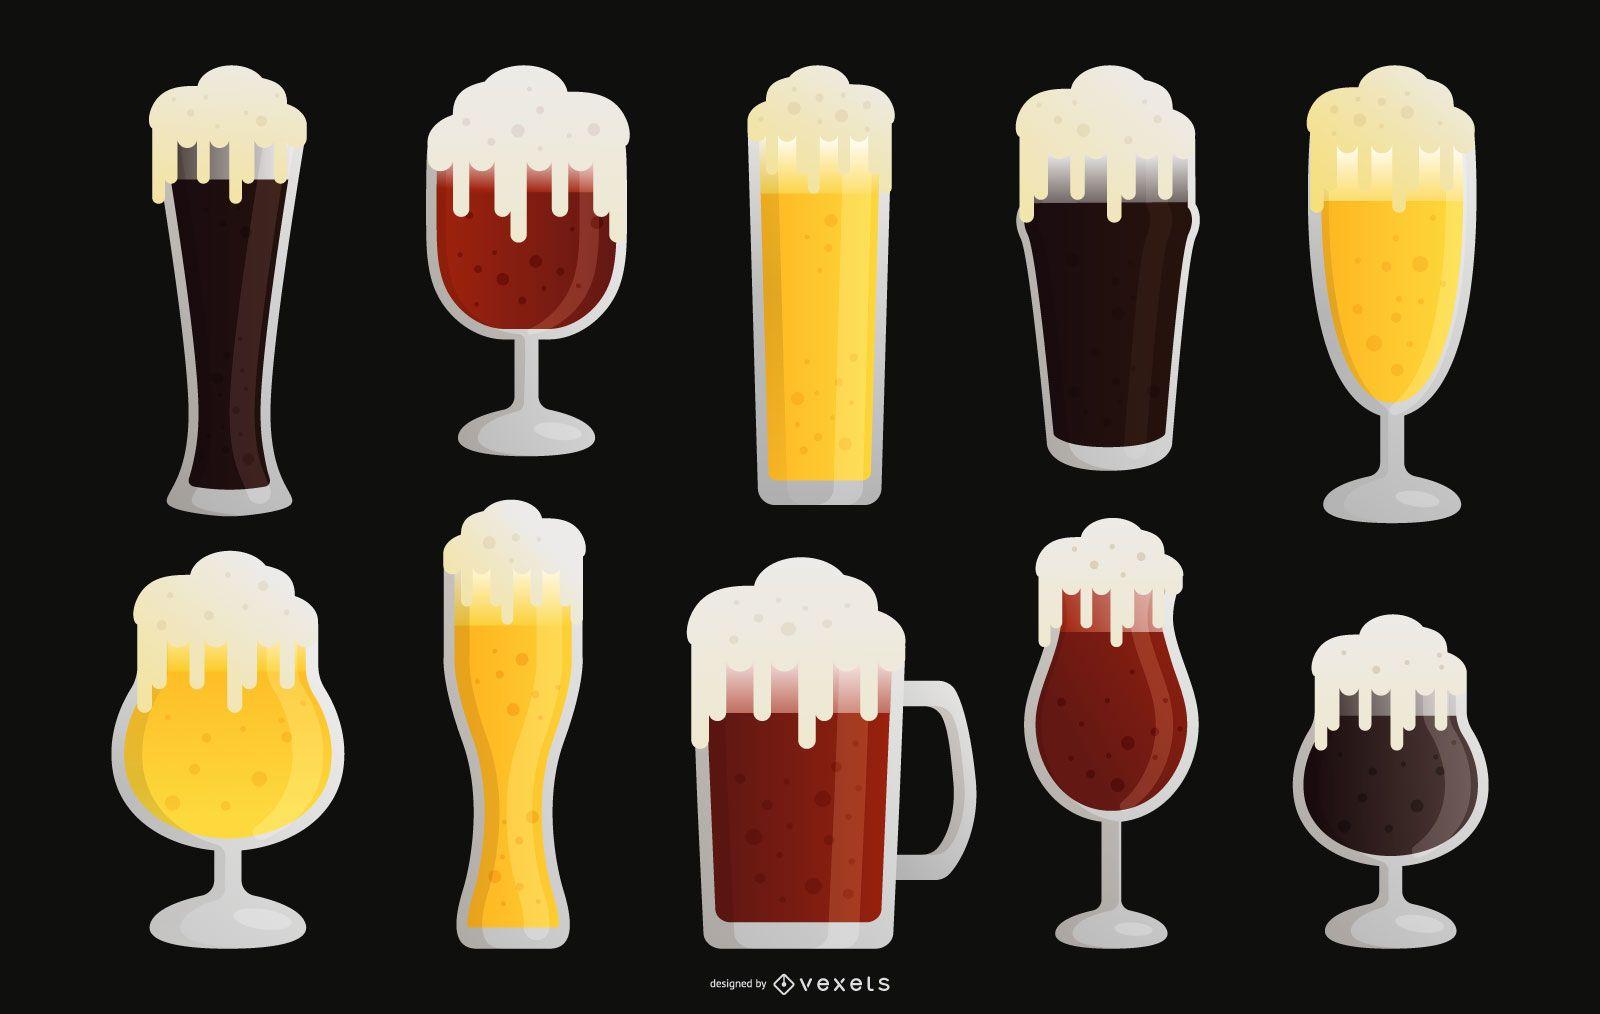 Colecci?n de vectores de dise?o plano de vidrio de cerveza